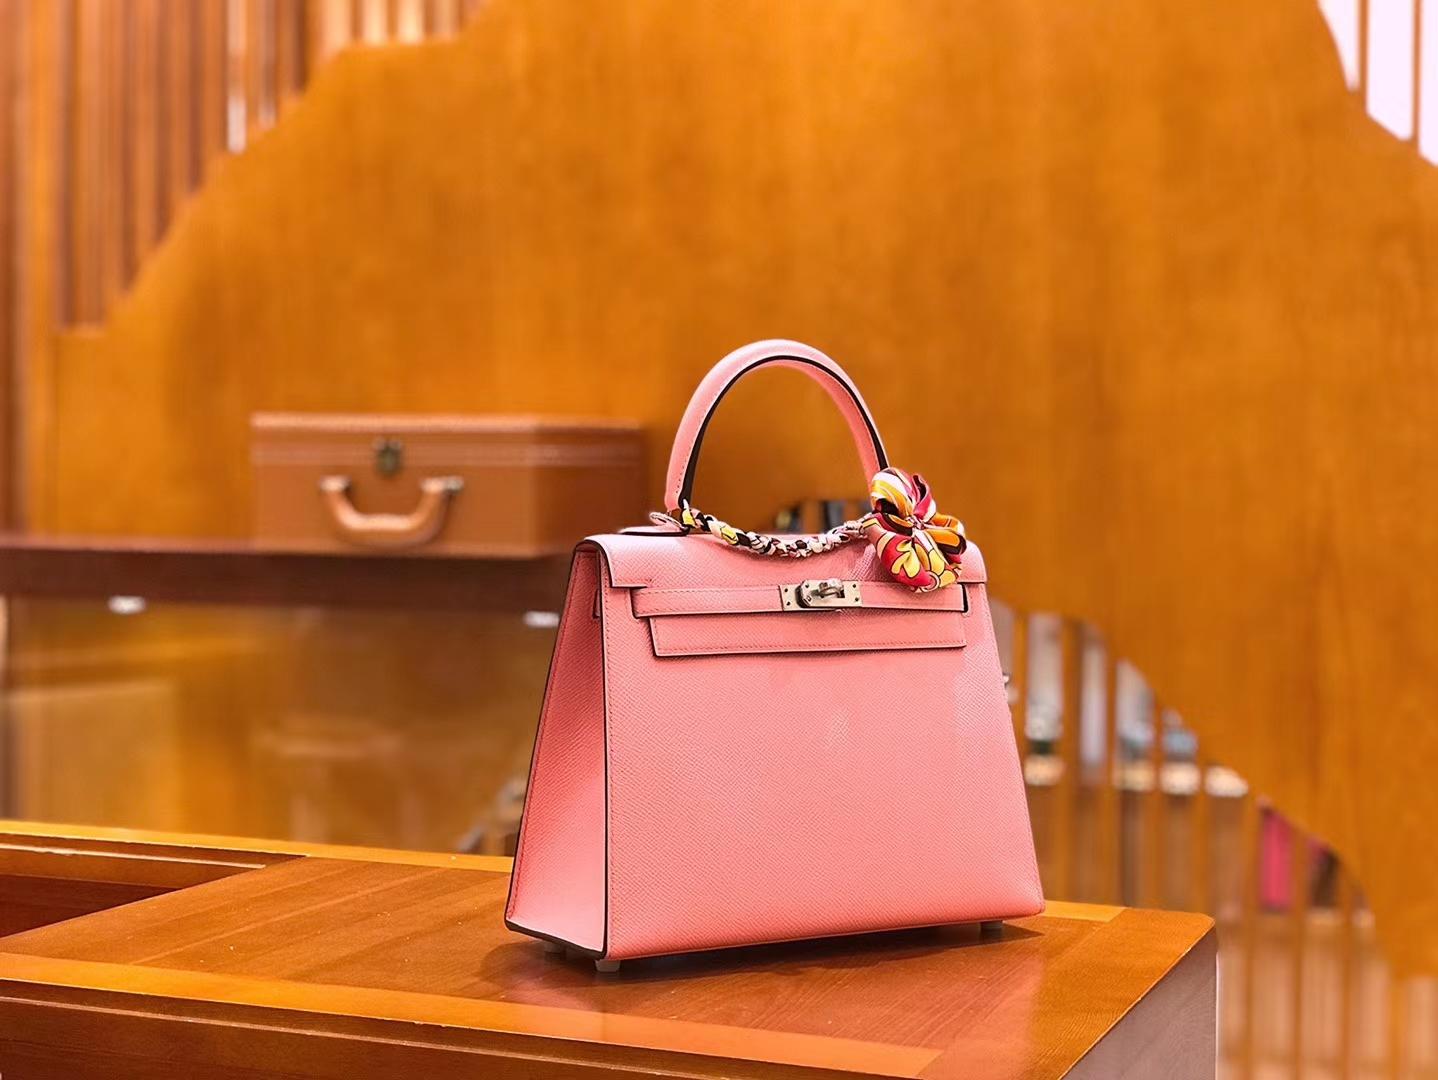 Hermès(爱马仕)Kelly 樱花粉 掌纹牛皮 全手工缝制 银扣 25cm